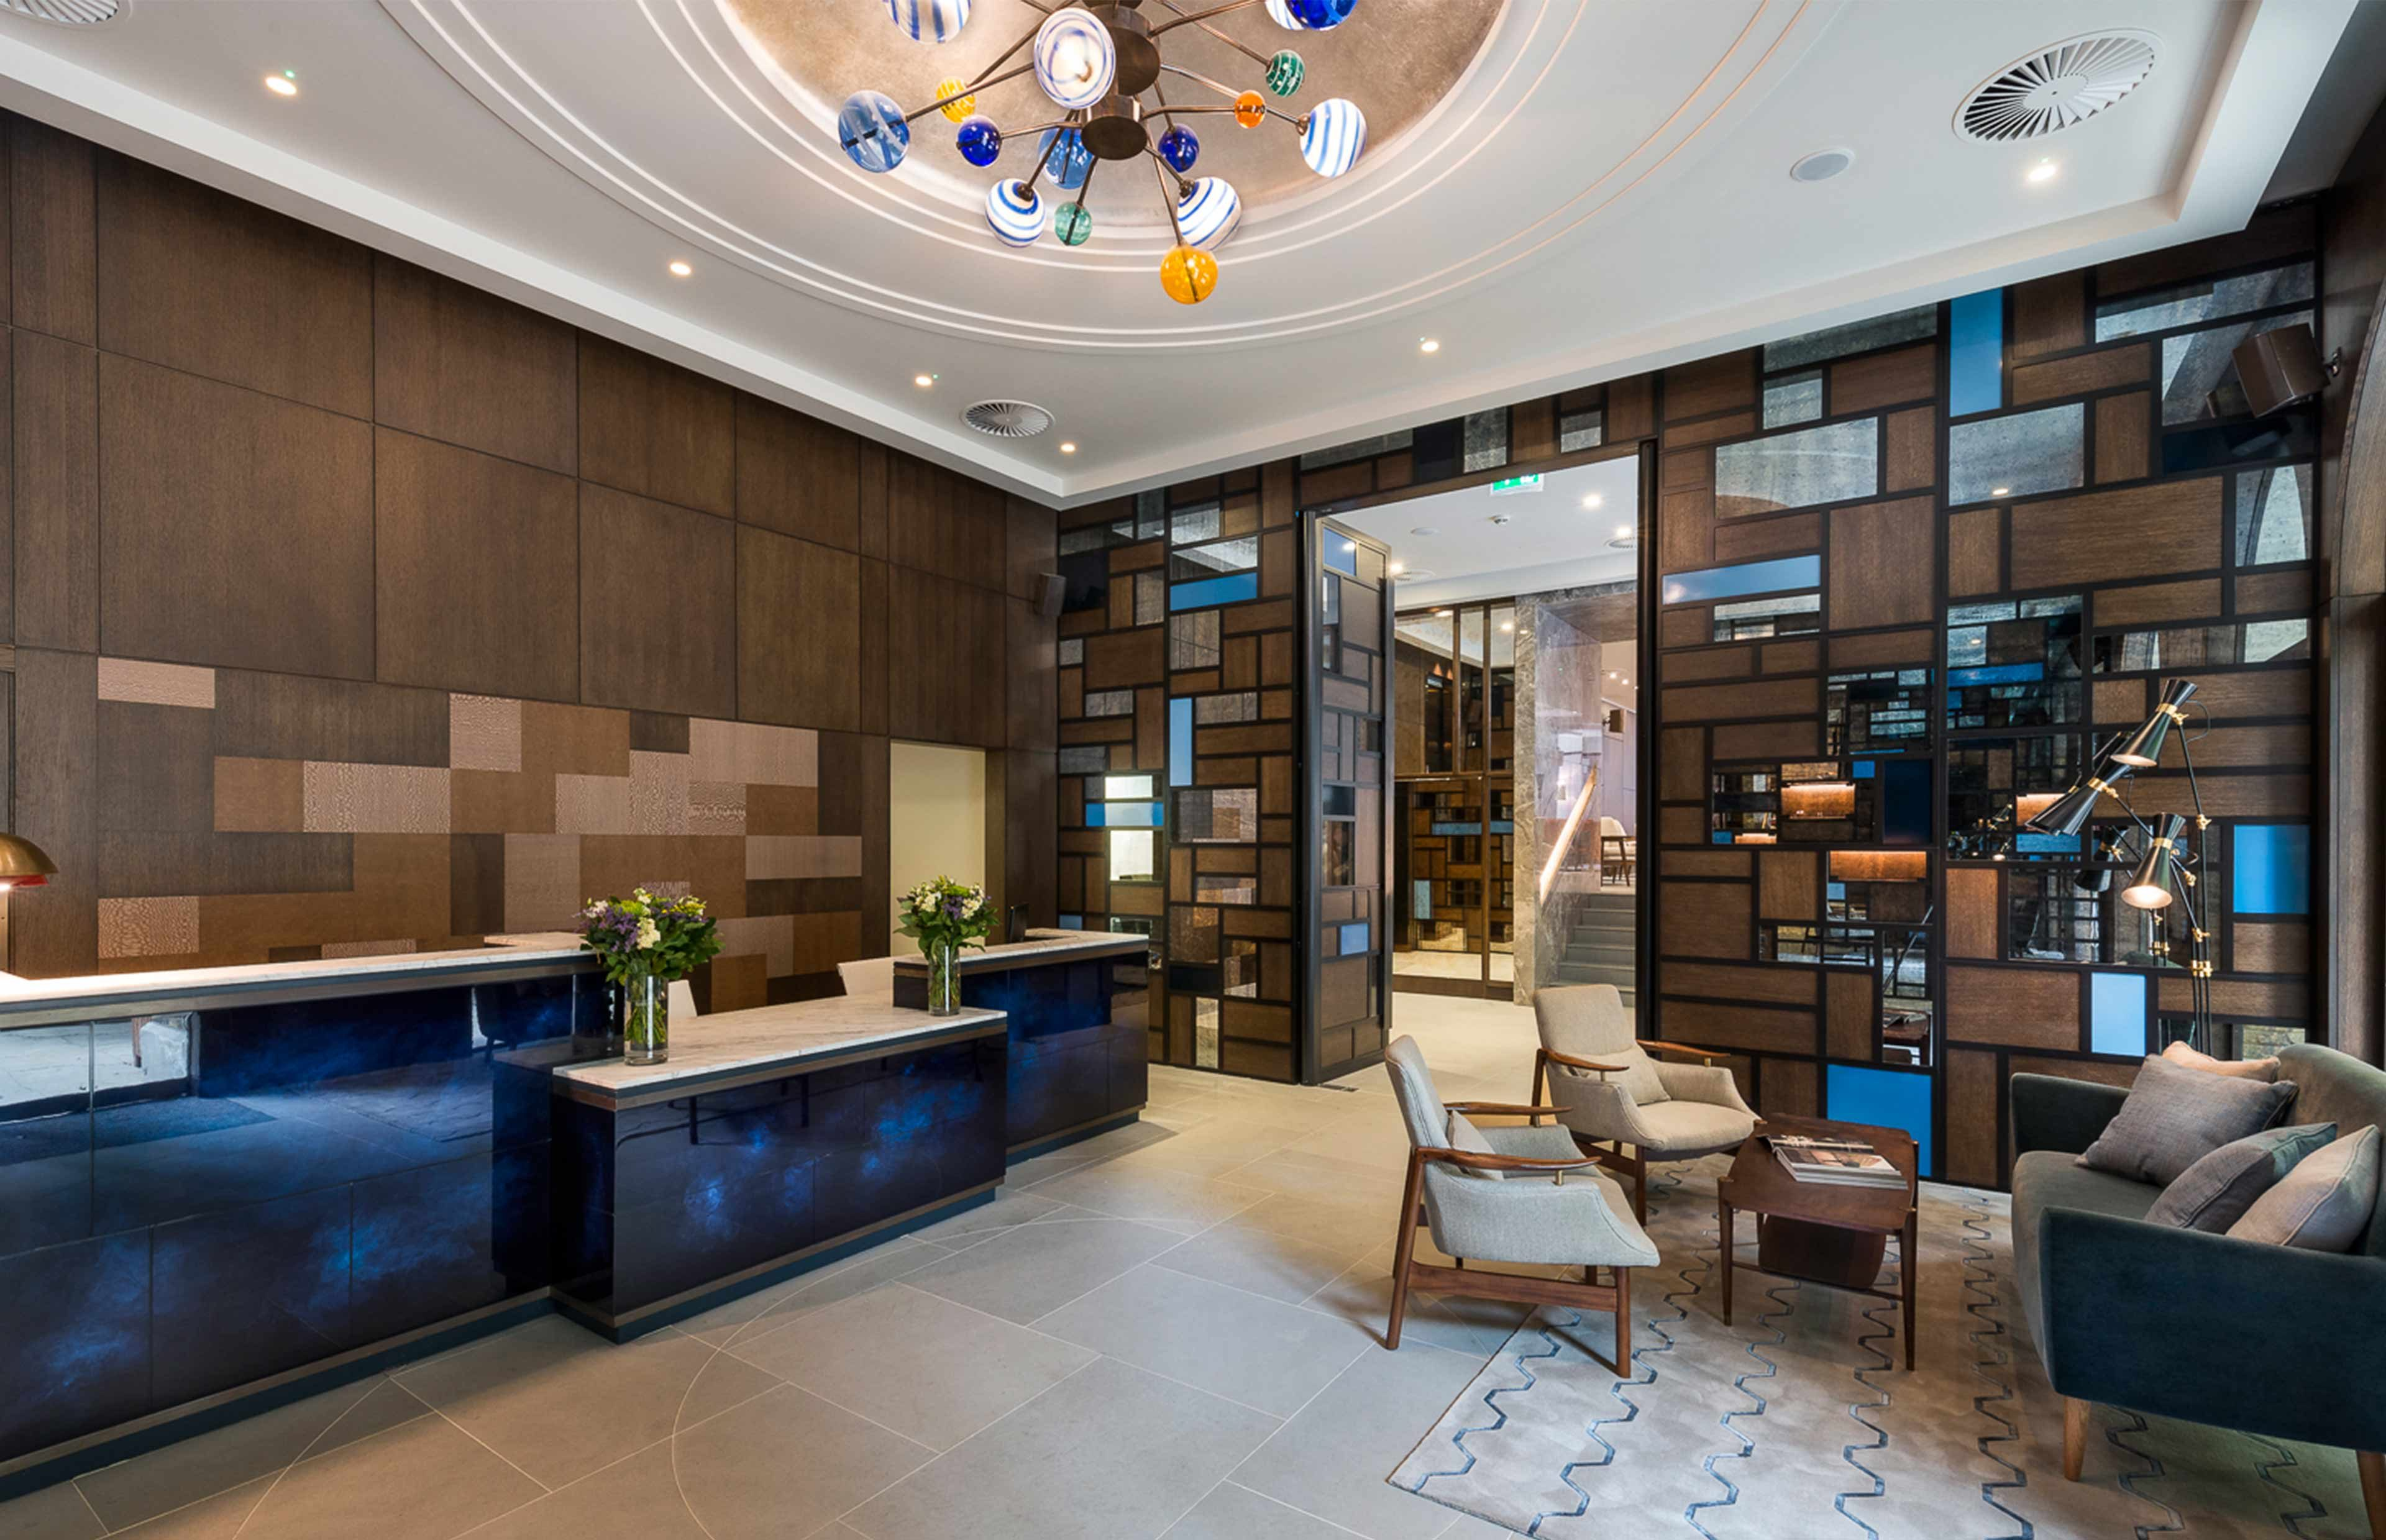 Hotel & spa lighting studio n lighting design & supply